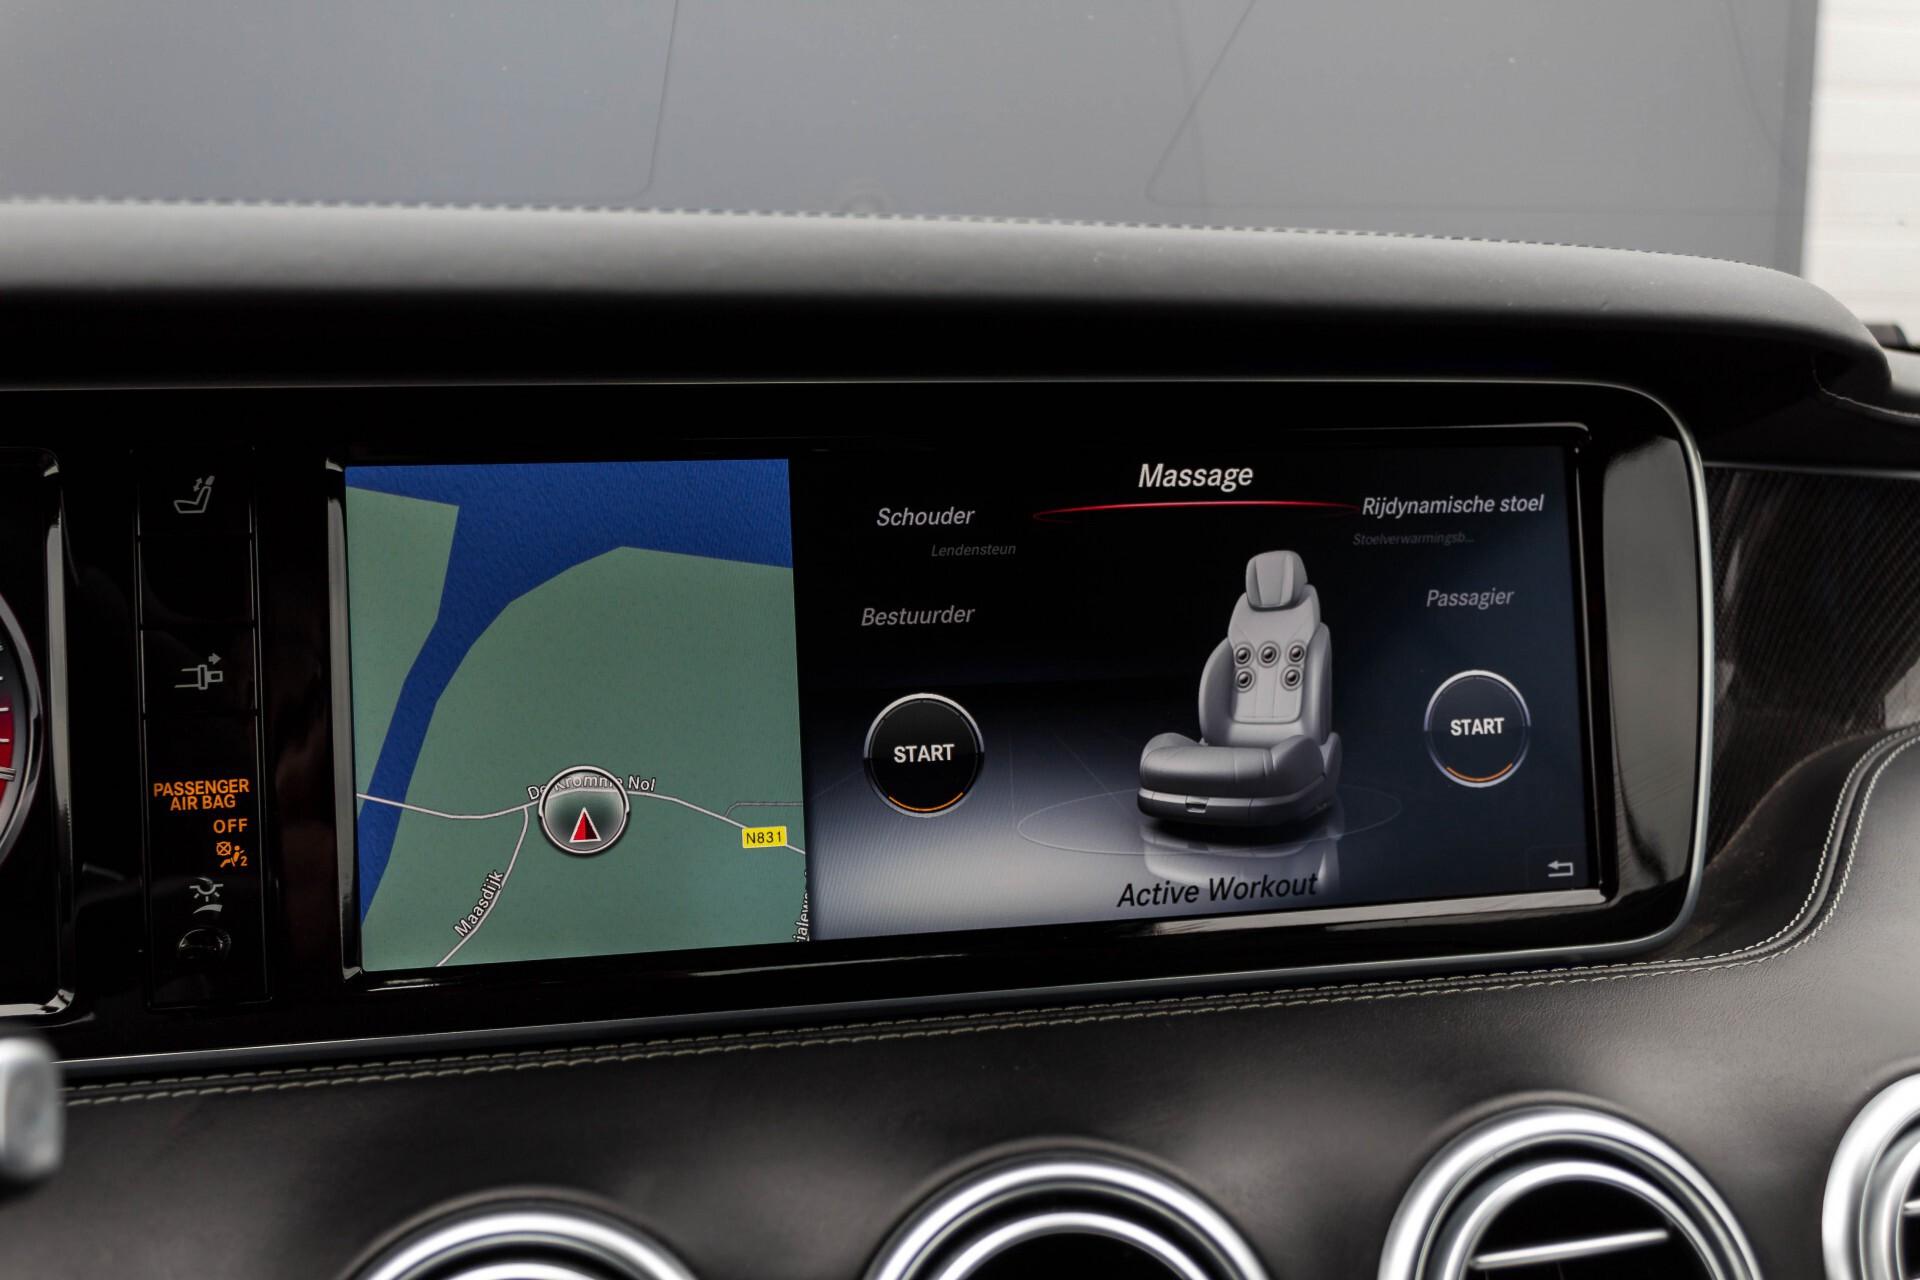 Mercedes-Benz S-Klasse Cabrio 63 AMG 4-M Ceramic/Designo/Carbon/Burmester High End Aut Foto 17